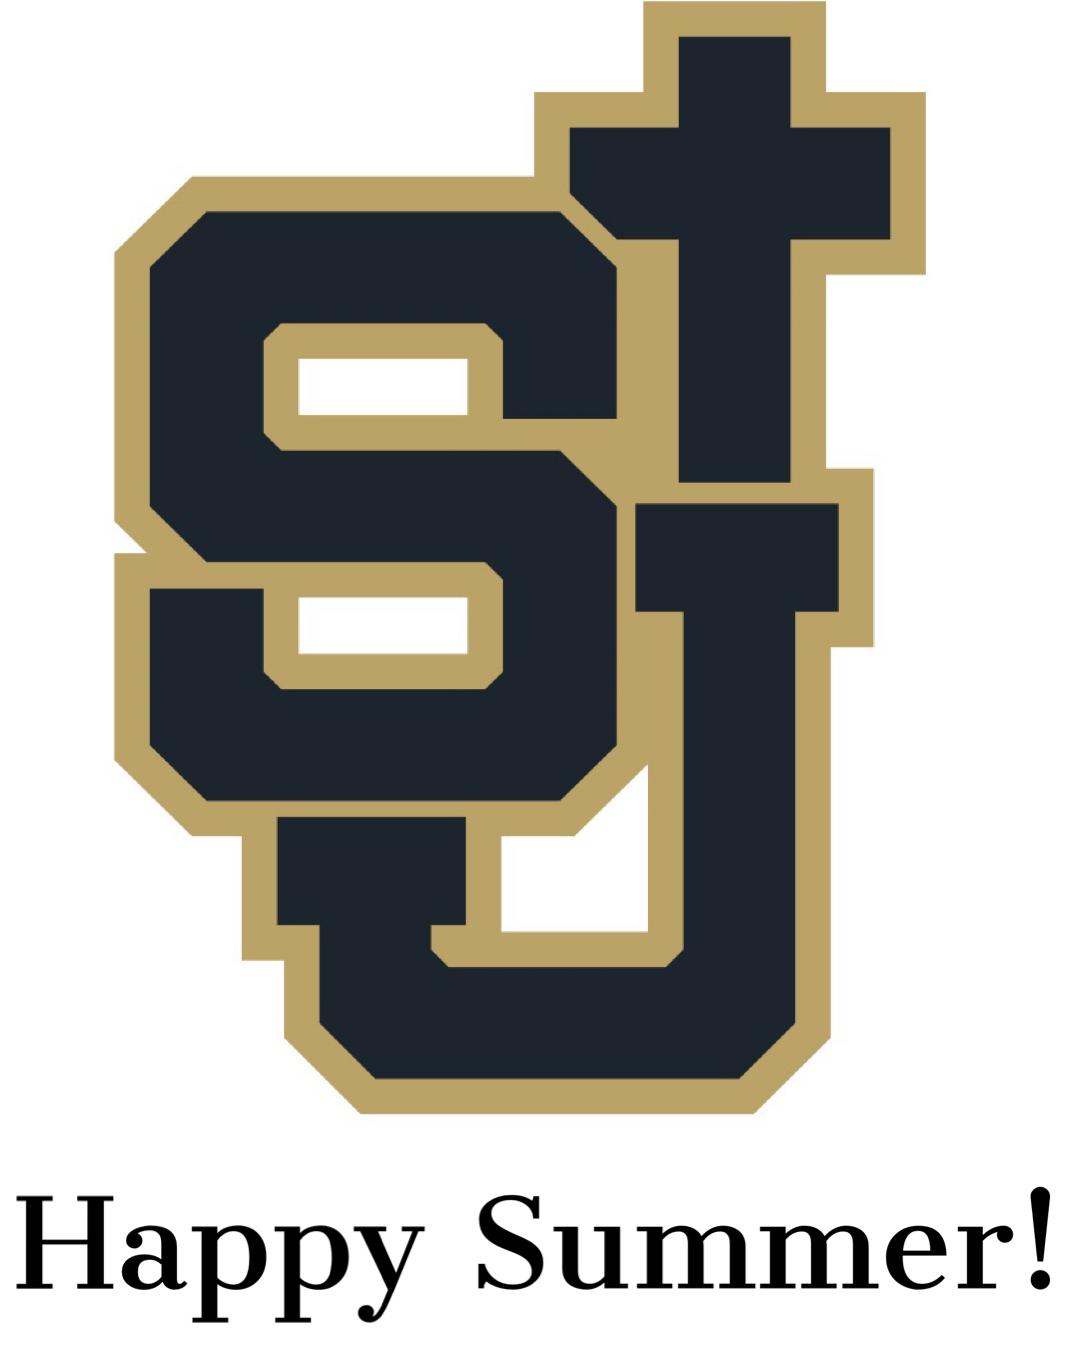 St. John's Lutheran School – Summer and Fall 2020Updates